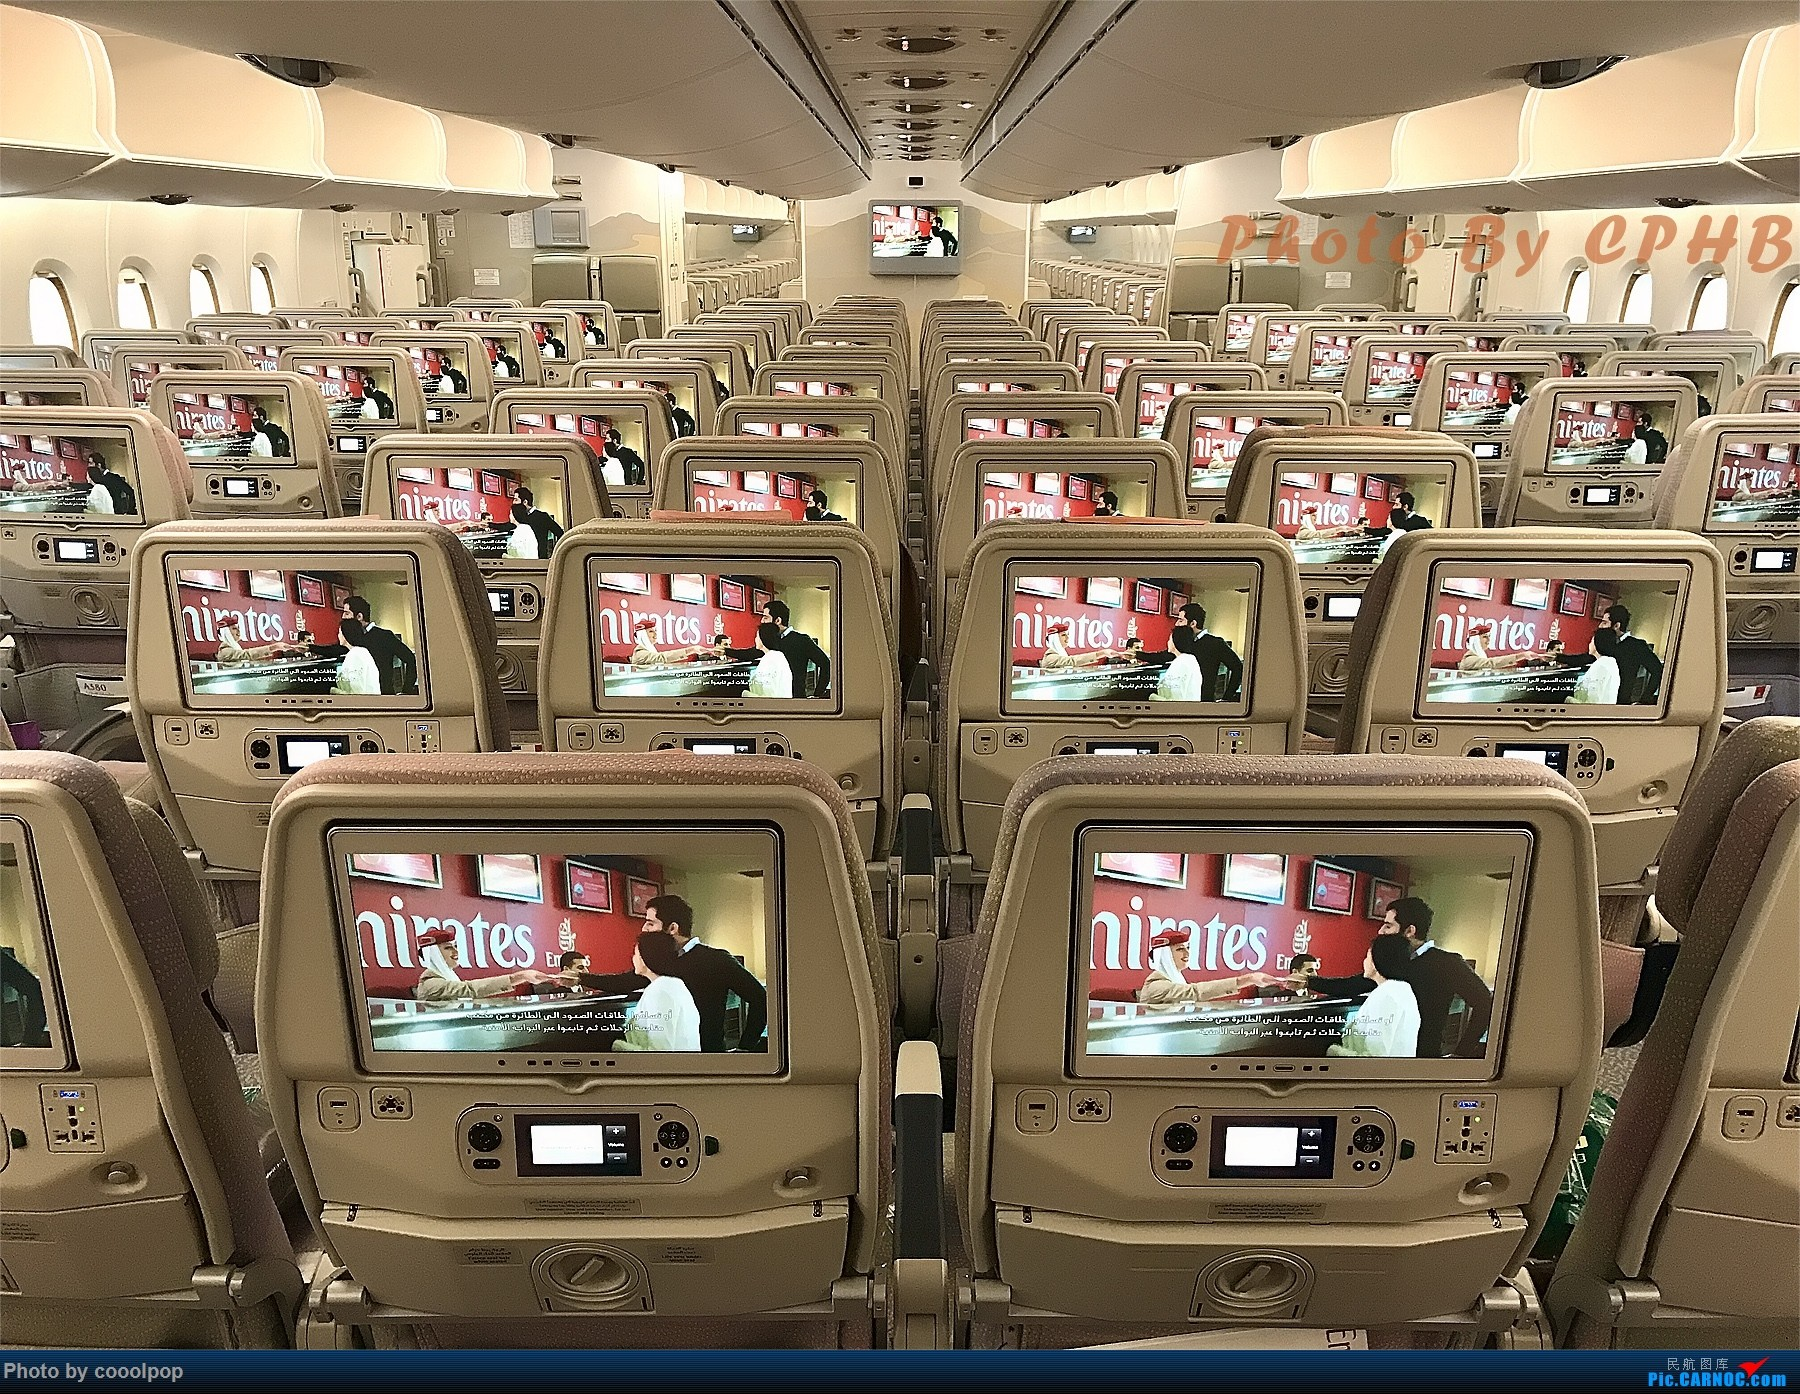 Re:好些年没来了!发了去年的游记帖子吧 PEK-CDG-VCE-DXB-PEK。法航 阿联酋航空混飞 EK A380驾驶舱 商务舱 头等舱 外场 A380-800 A6-EEC 中国北京首都国际机场